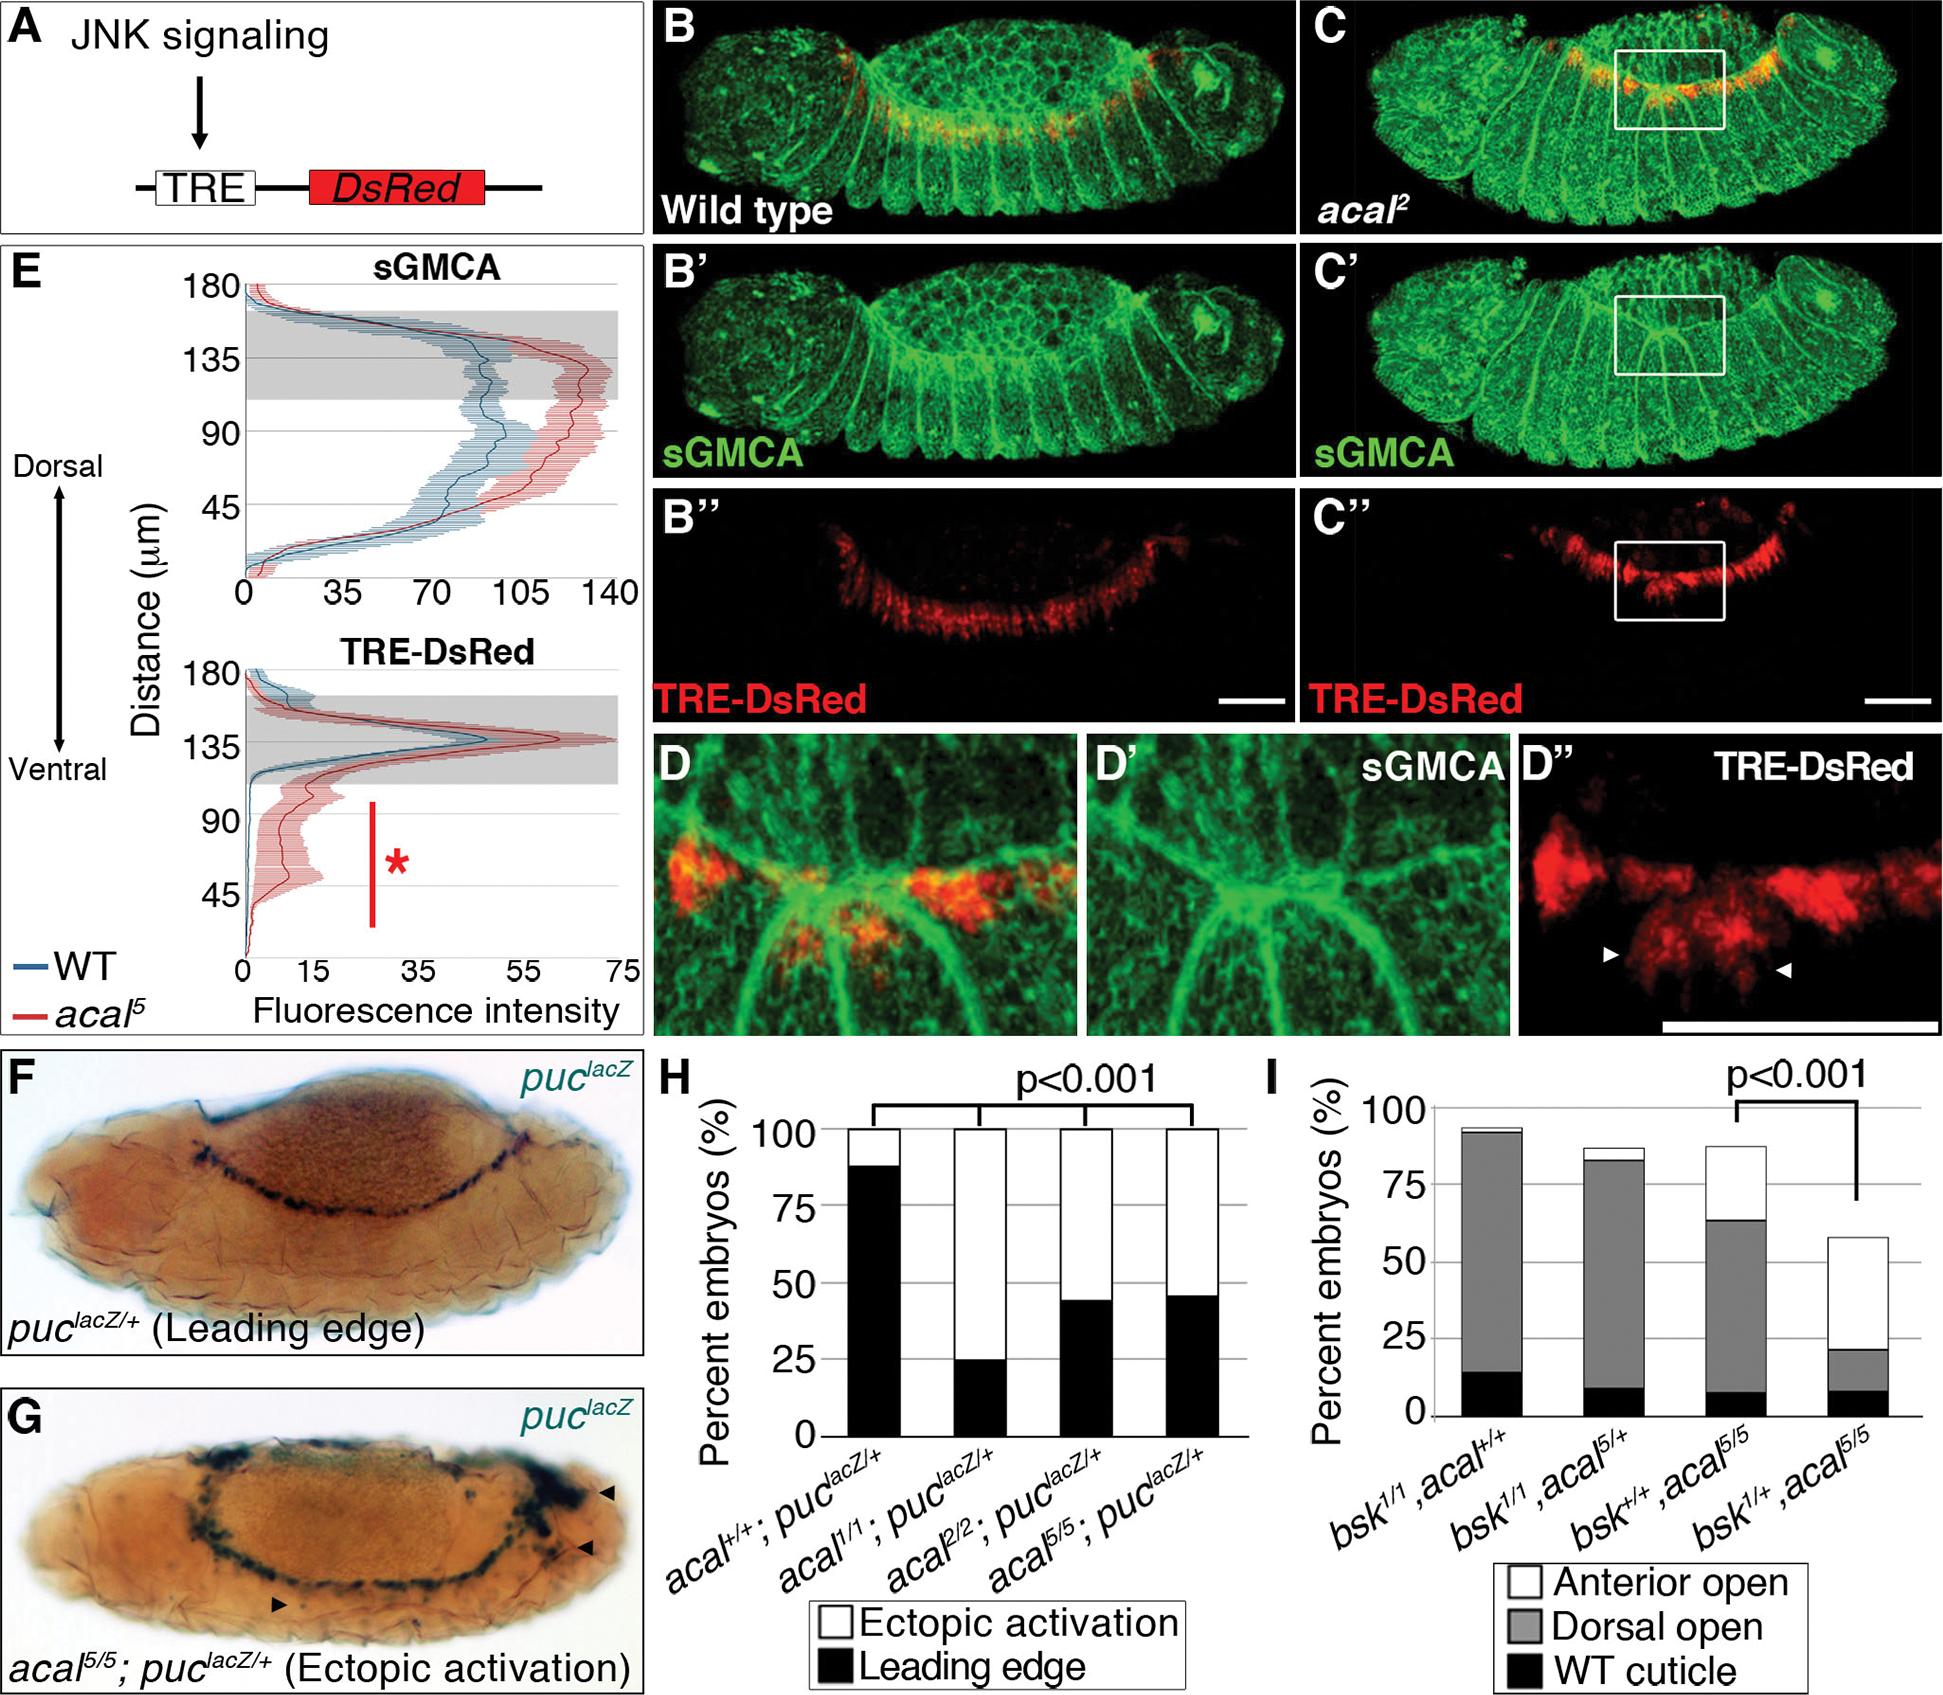 Ectopic JNK signaling activation in <i>acal</i> mutants.